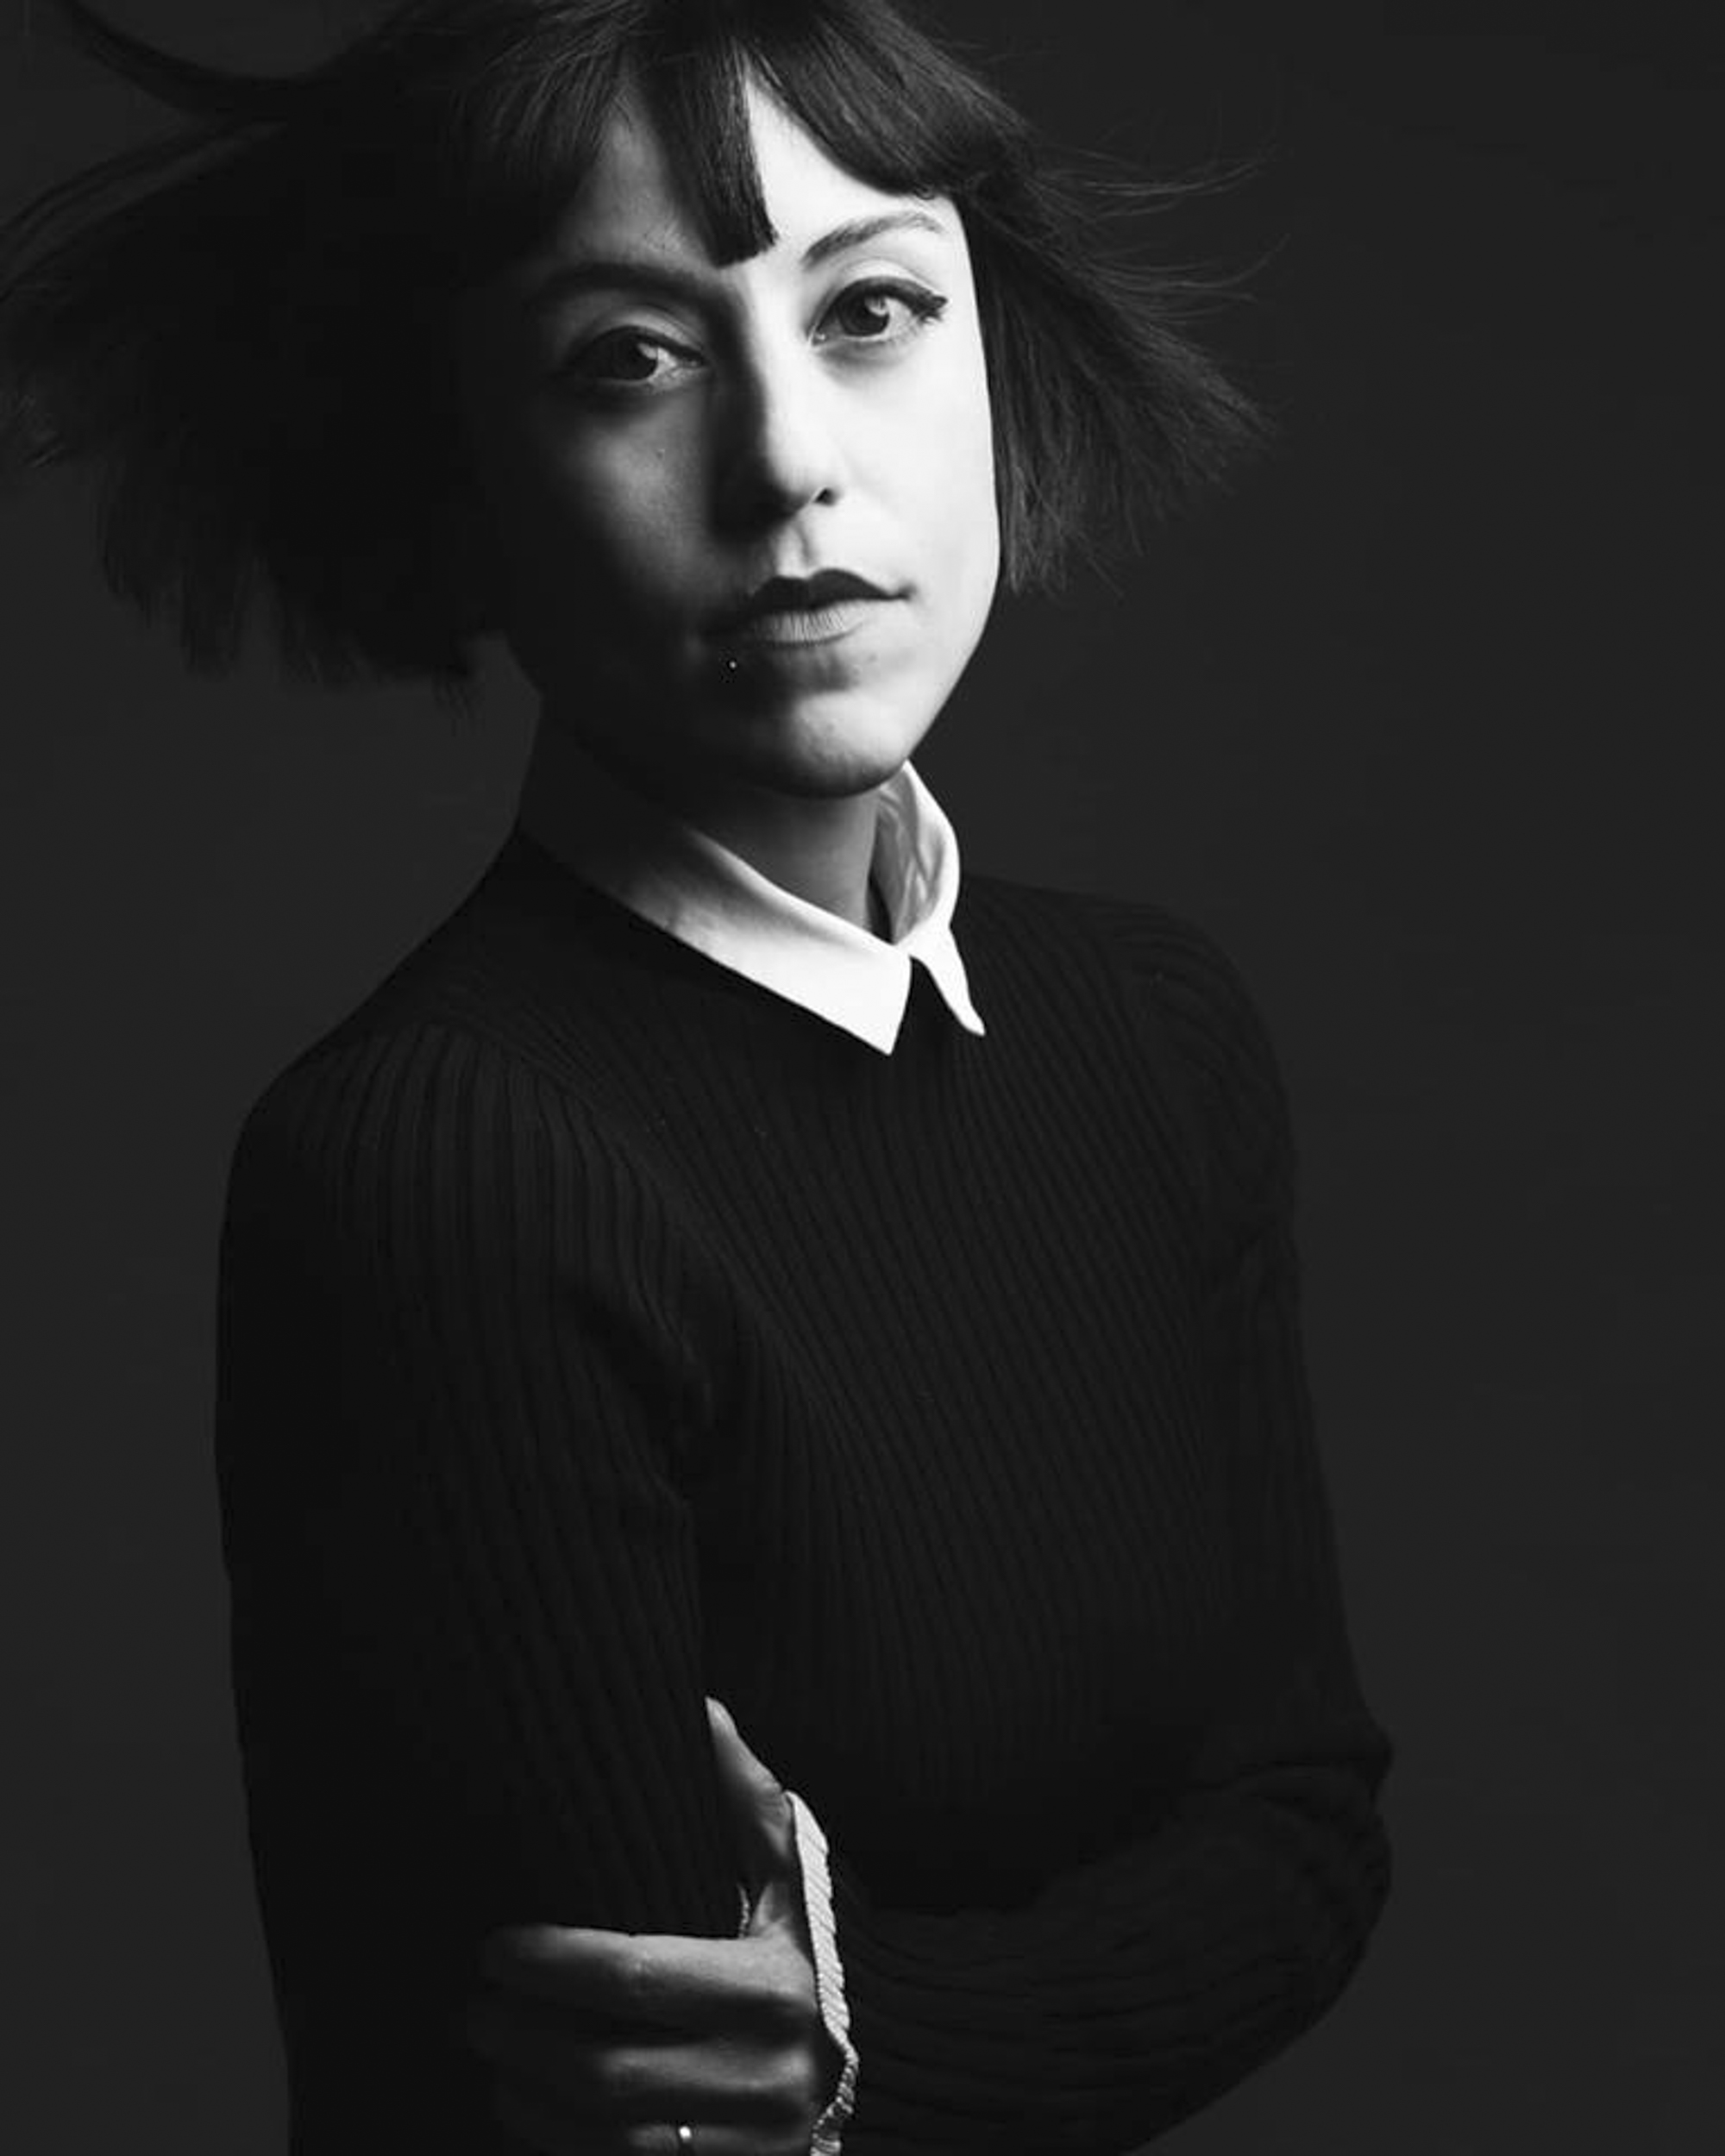 Portraits-Cihanbektas-6.jpg